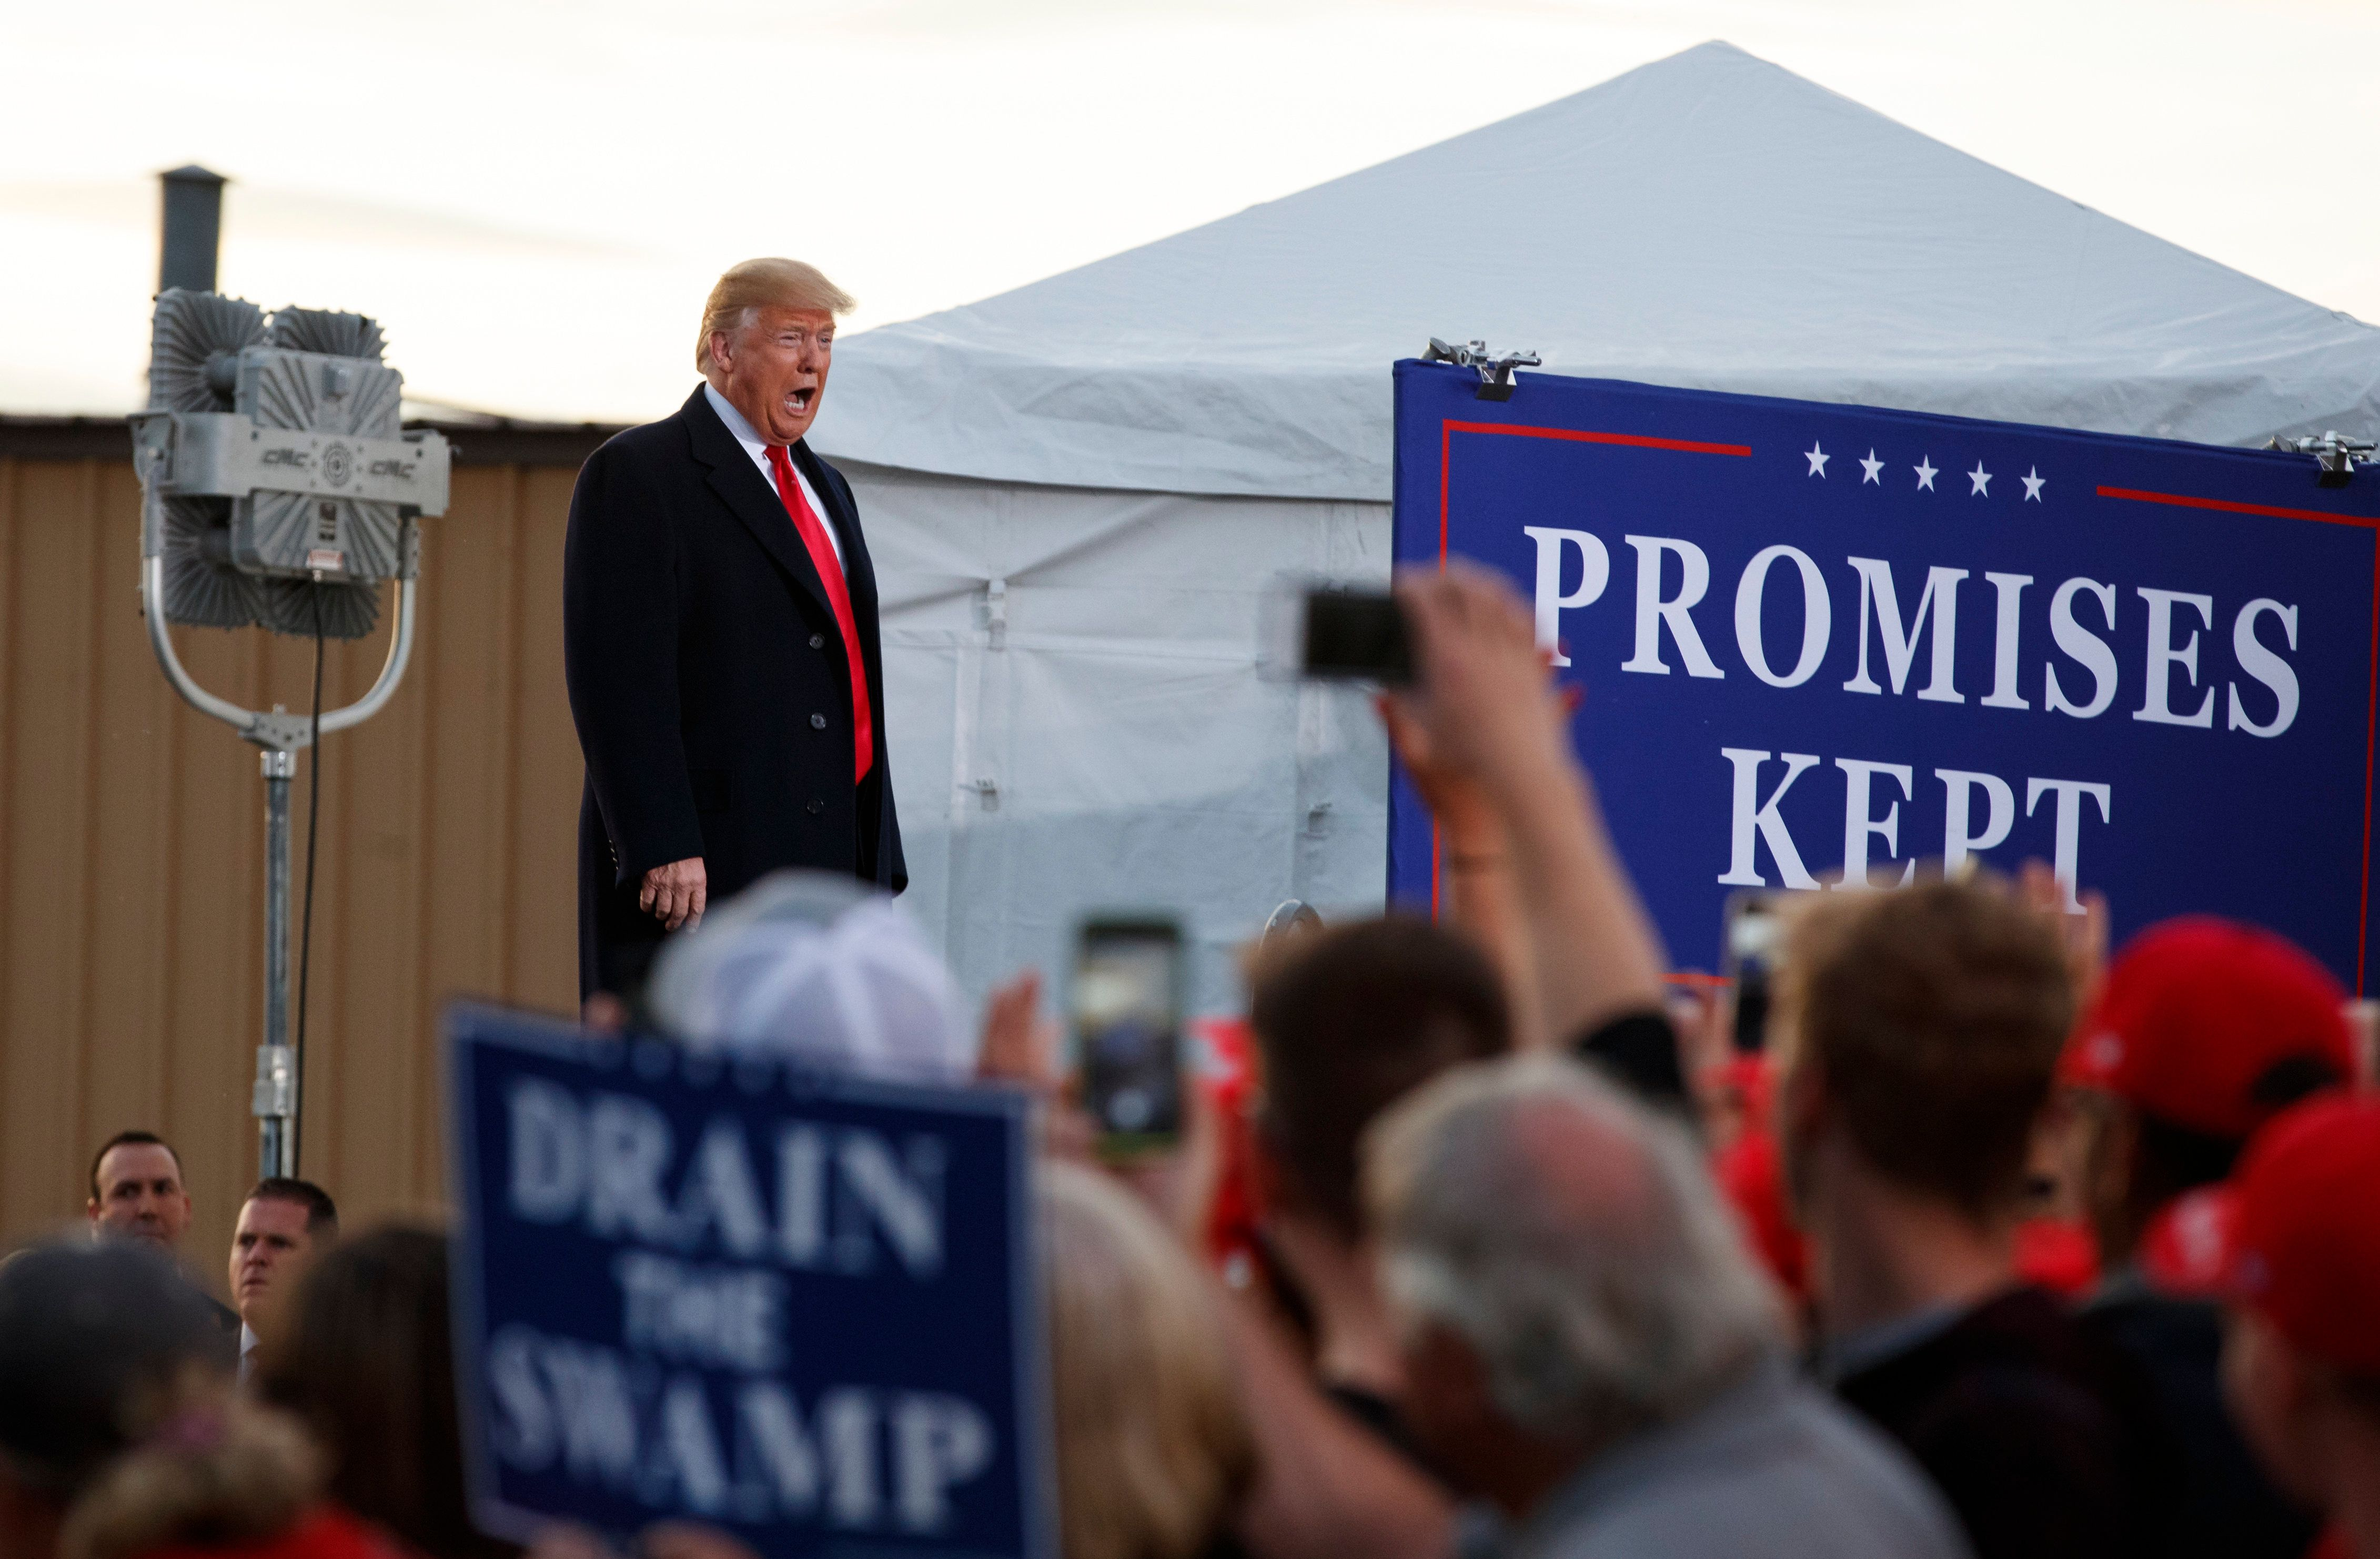 'He's My Kind Of Guy': Trump Celebrates Congressman Who Body-Slammed